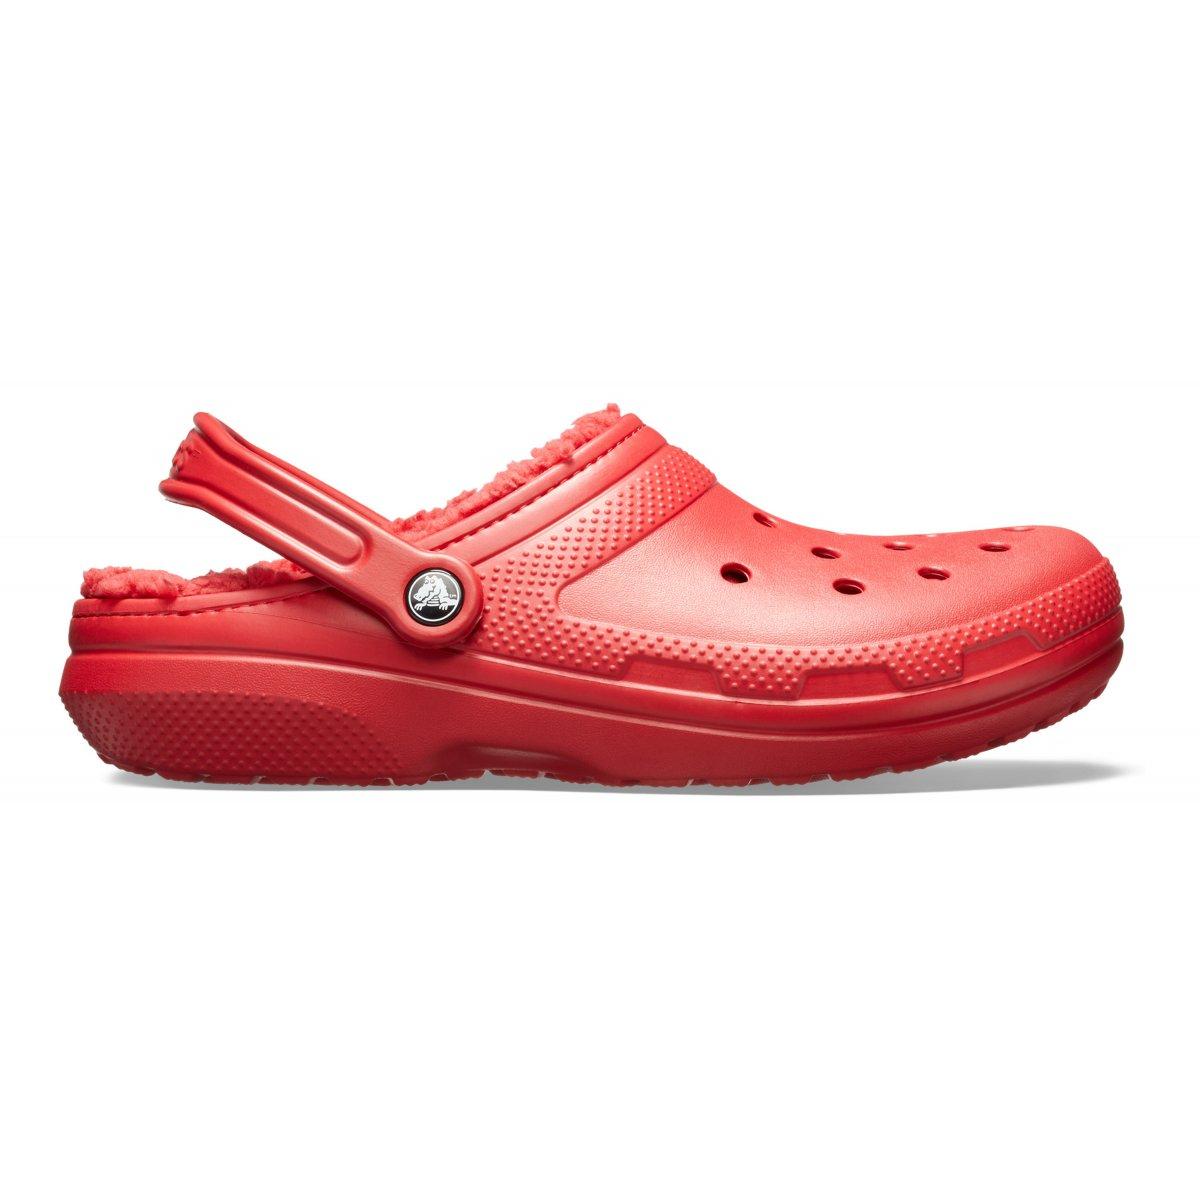 Lined UomoCrocs Clog Sabot Footwear Classic Italia l1JcFKT3